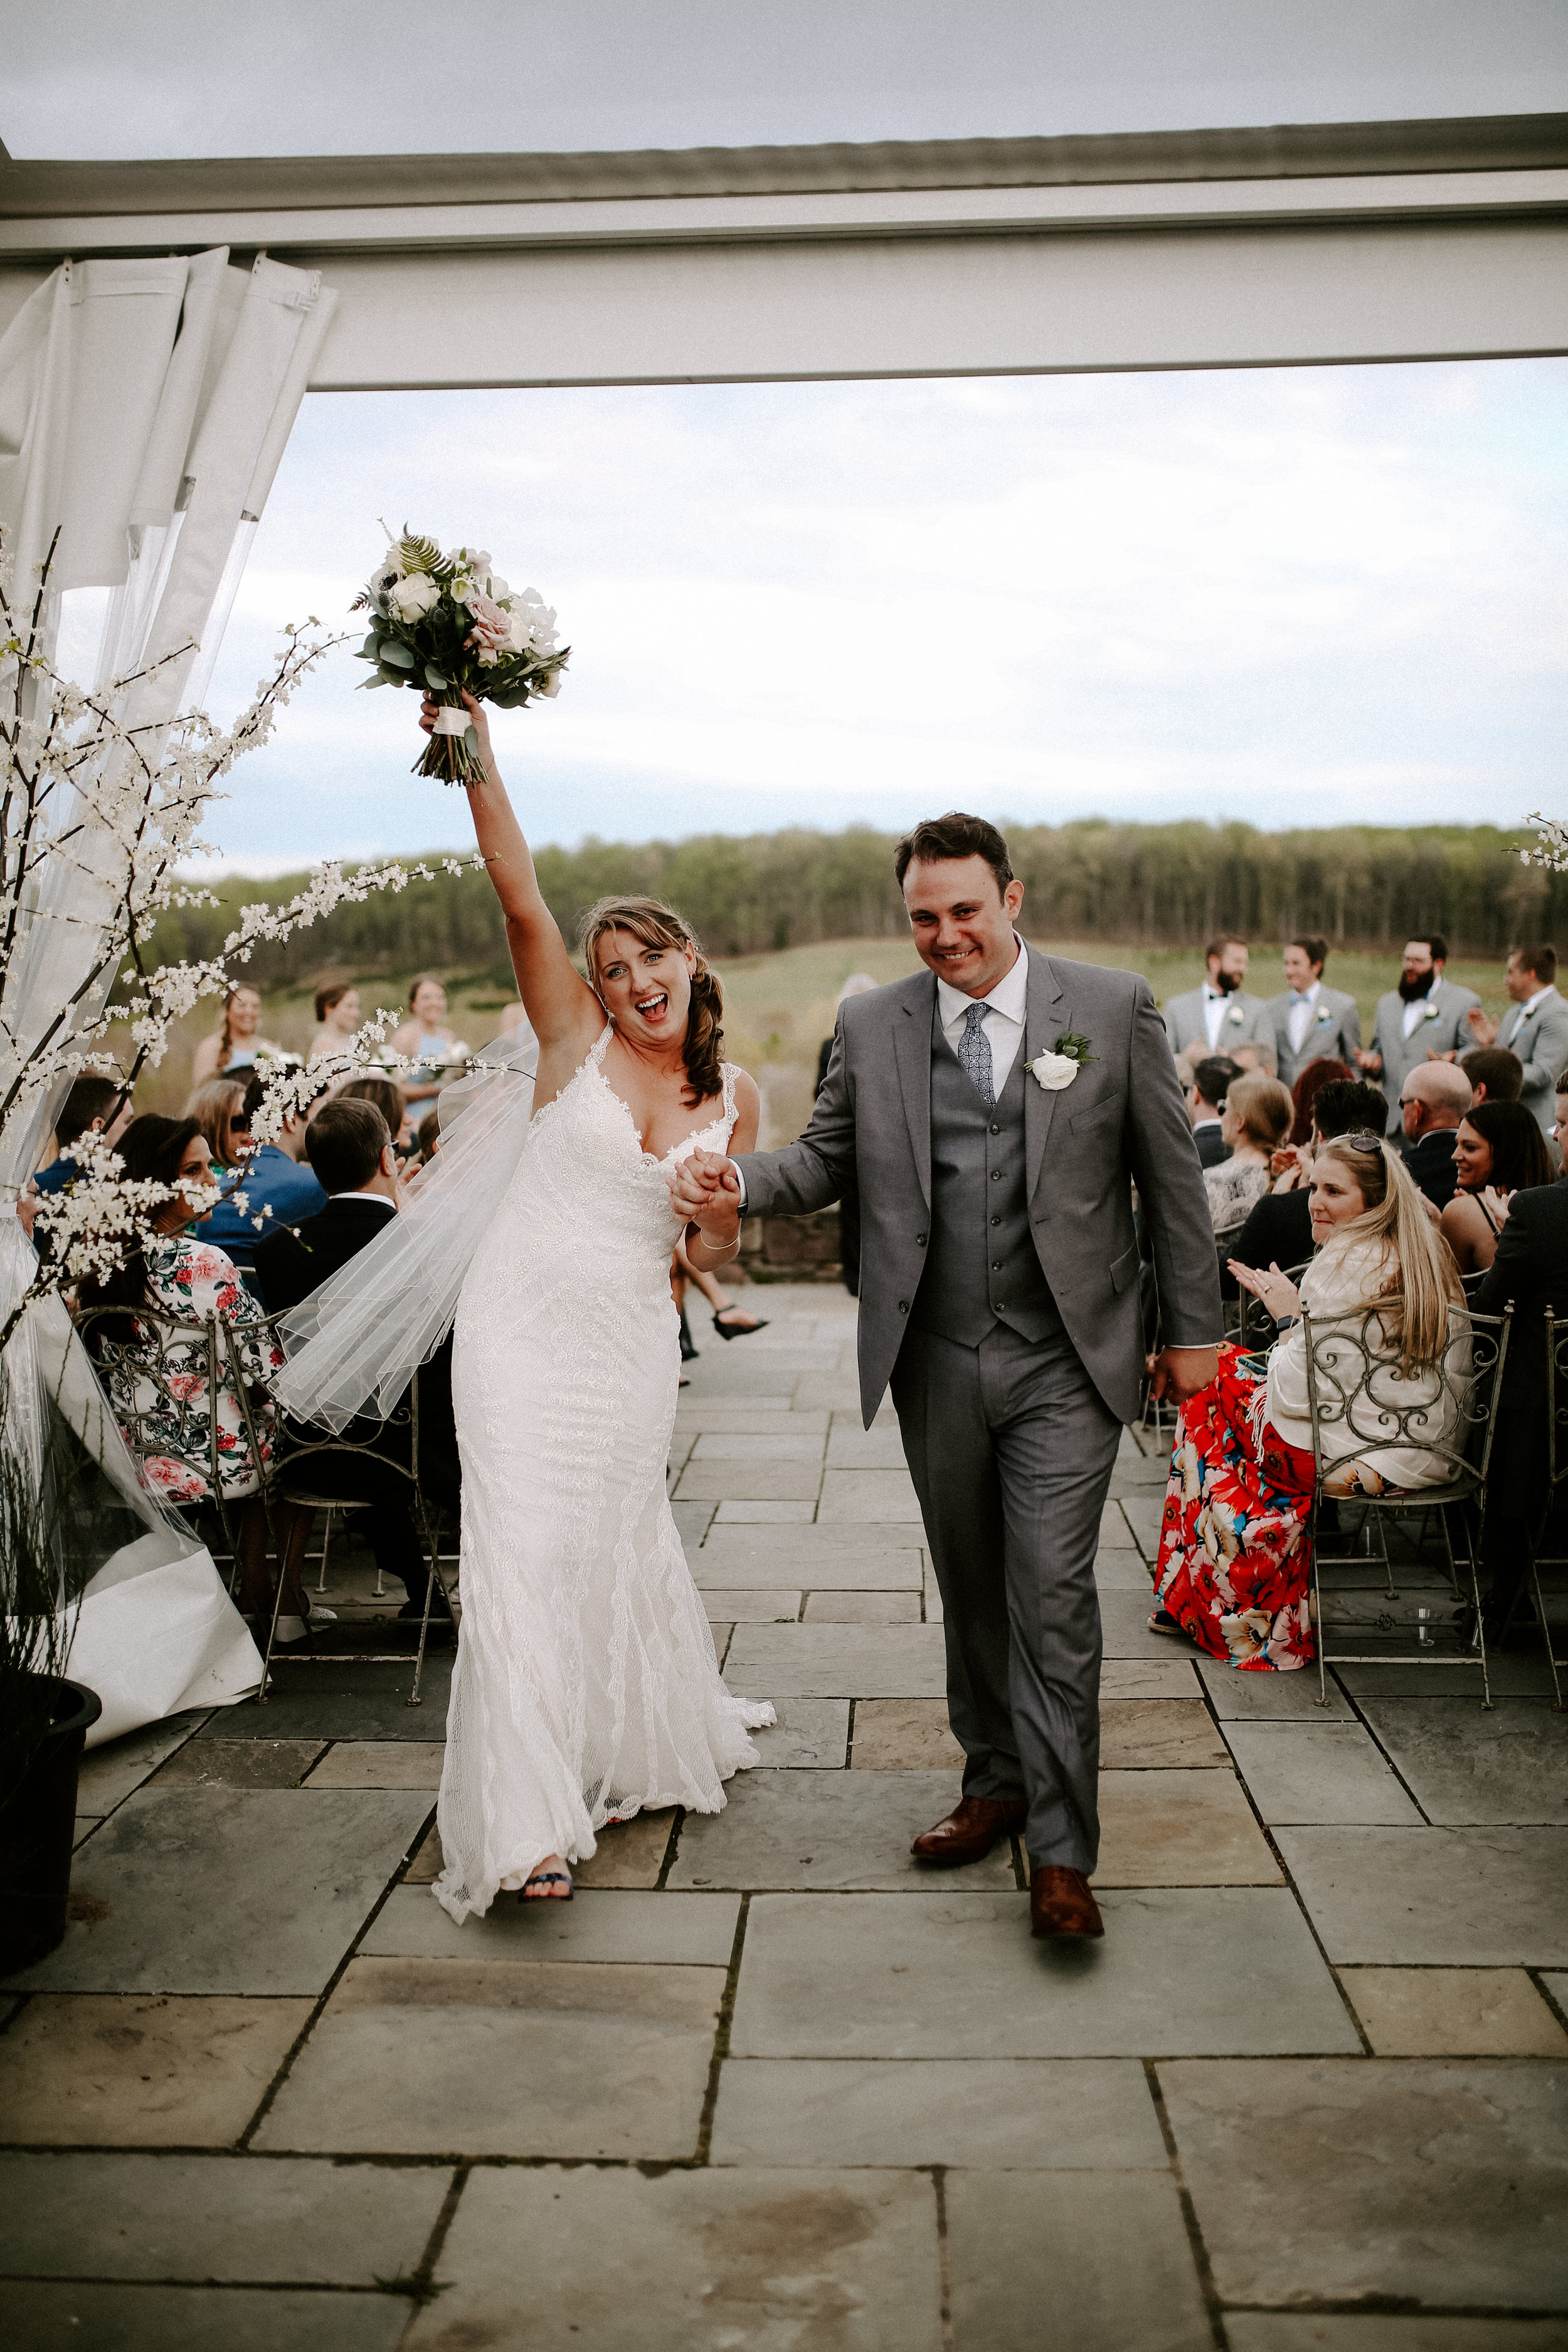 TheGreens_Married_2019-355.jpg